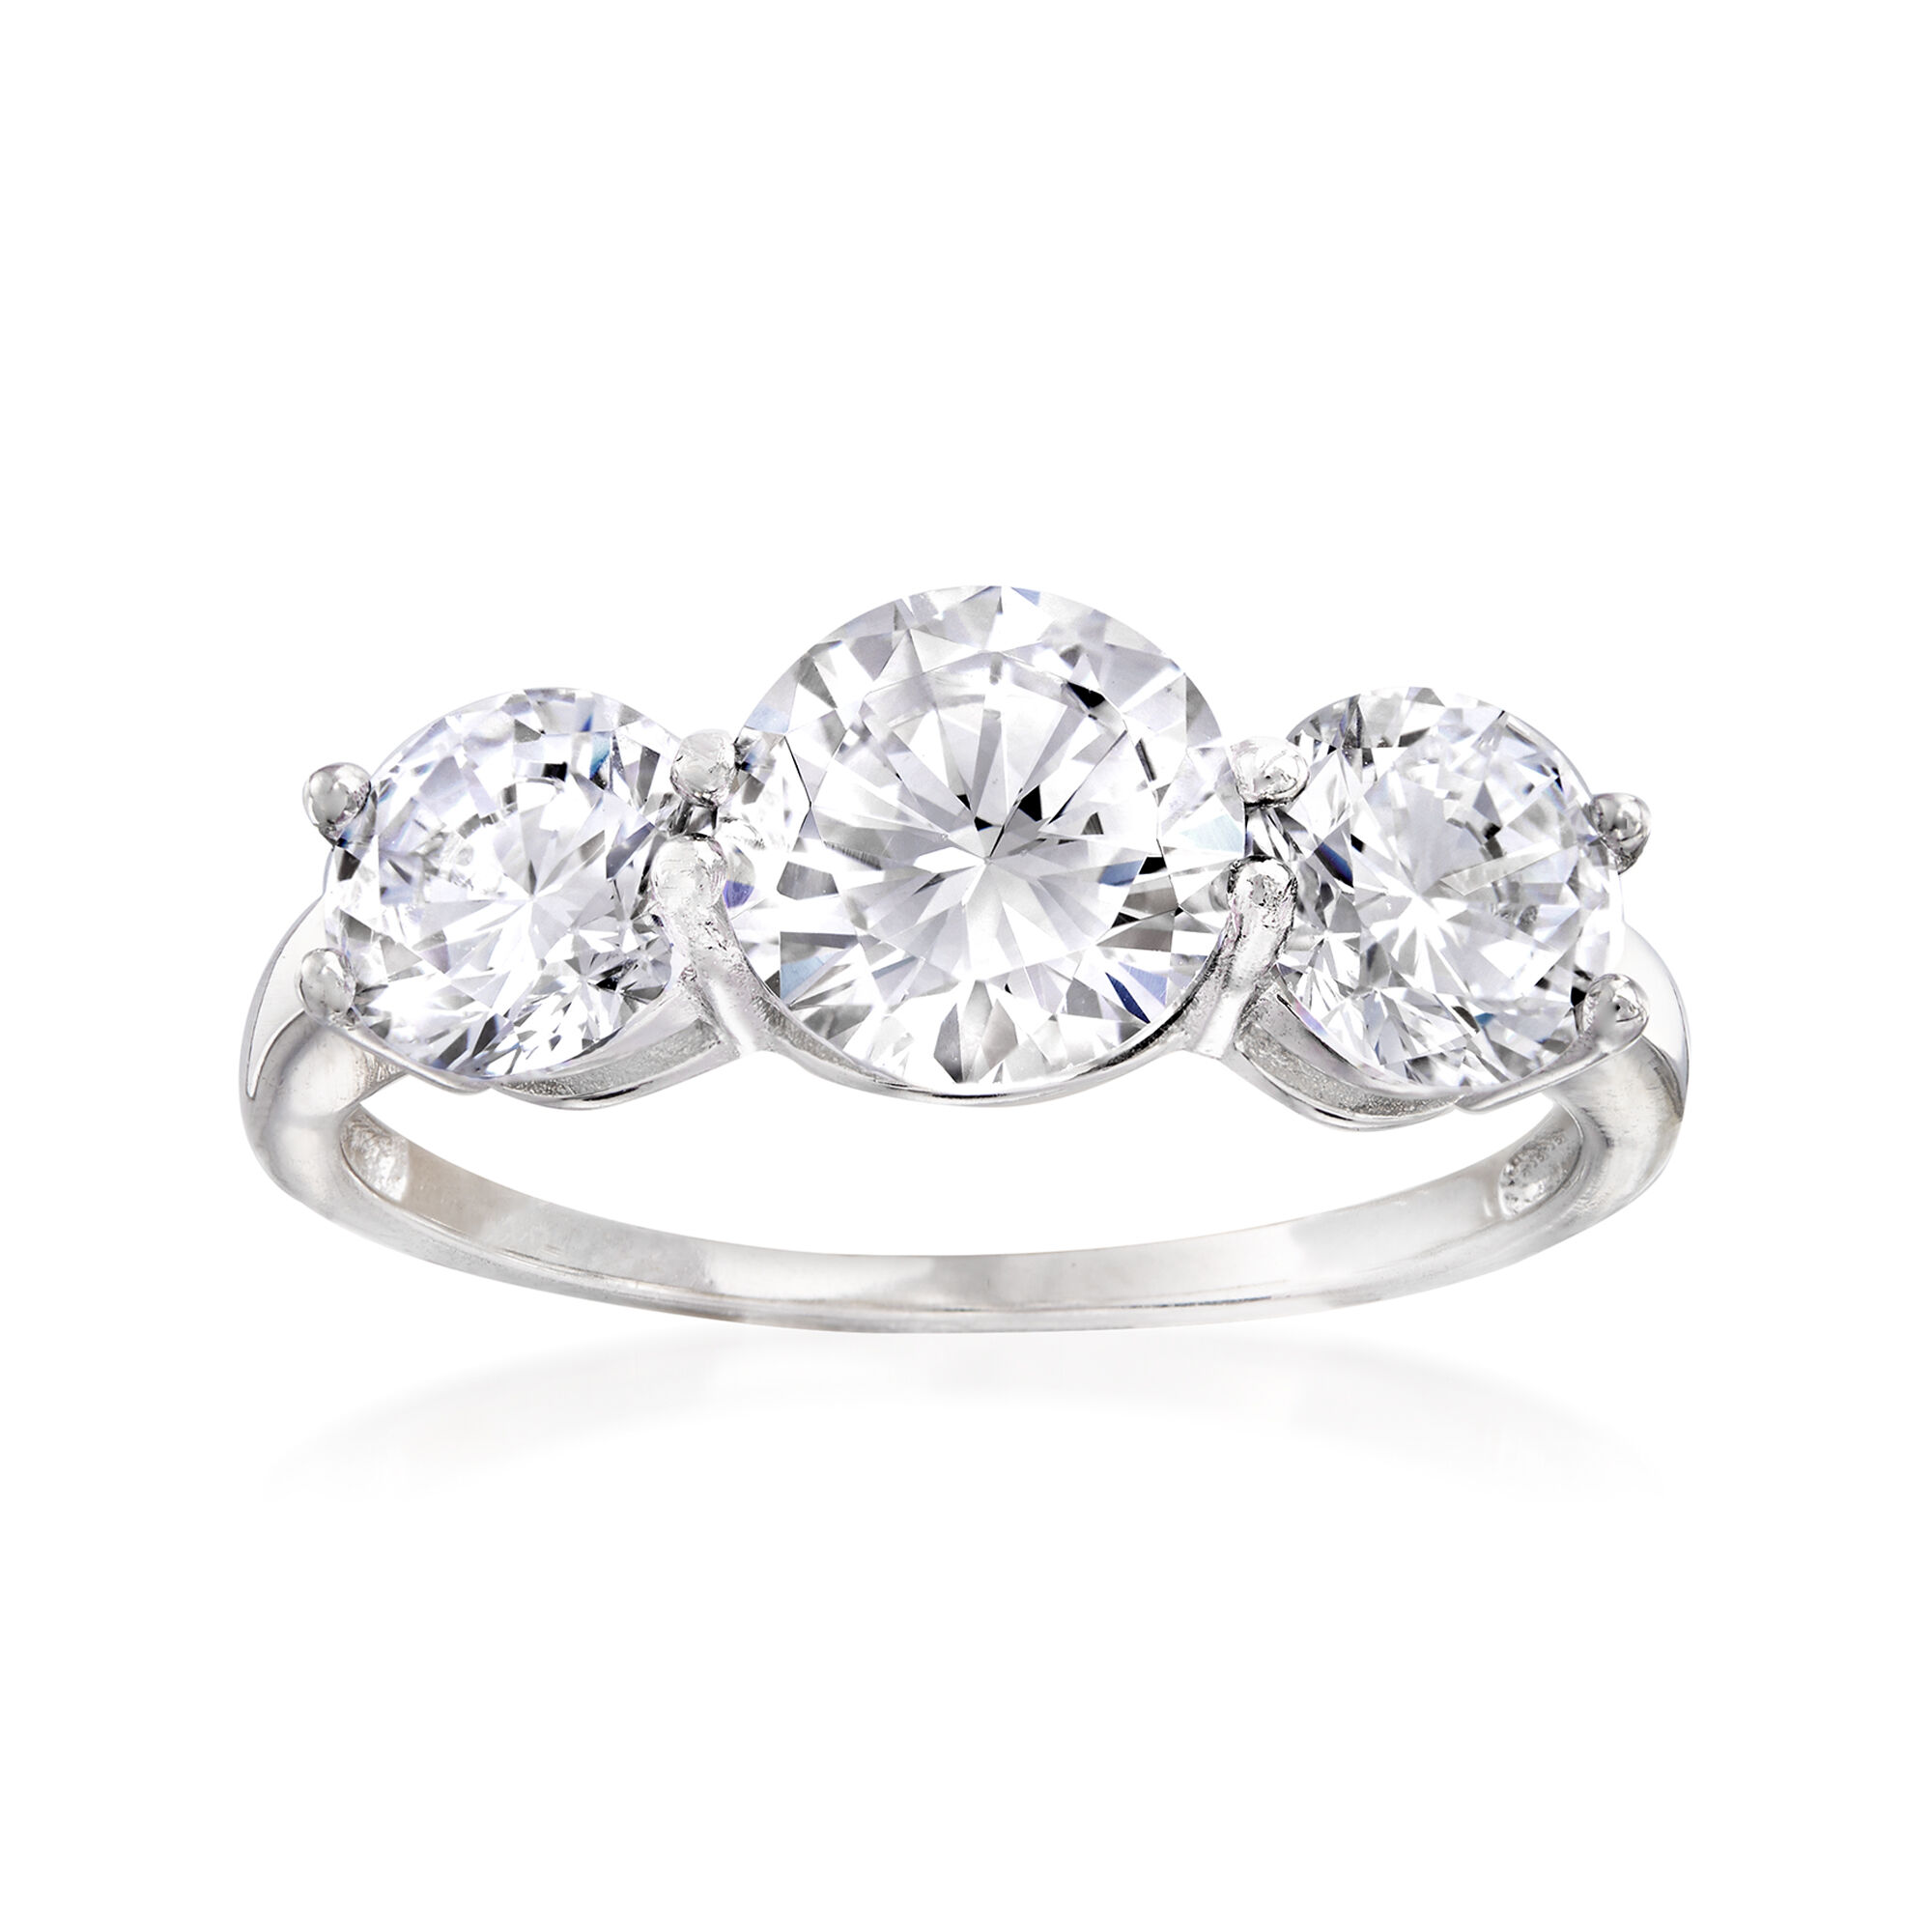 6MM Sterling Silver Round 1.75ct CZ Three Stone Wedding Anniversary Ring Band